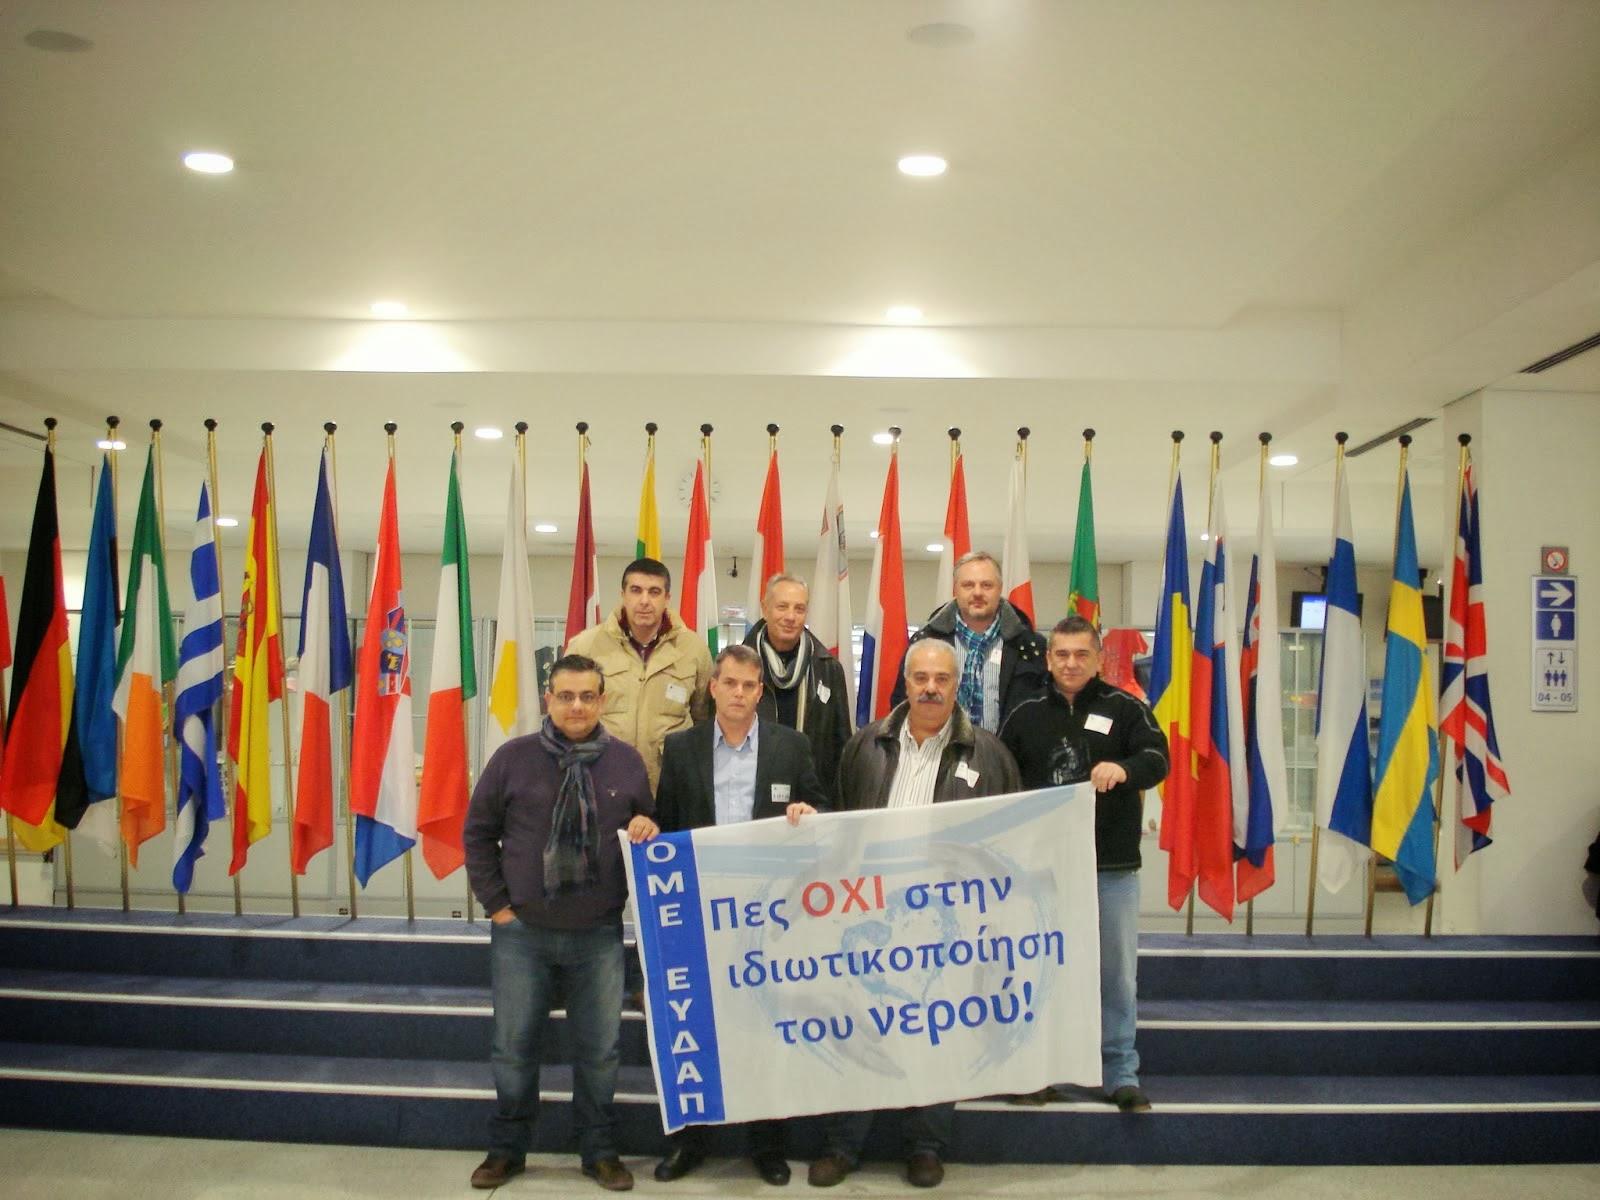 right2water (υπό την αιγίδα της EPSU)η ΟΜΕ - ΕΥΔΑΠ σαν εκπρόσωπος της Ελλάδος, στο Ευρωκοινοβούλιο.